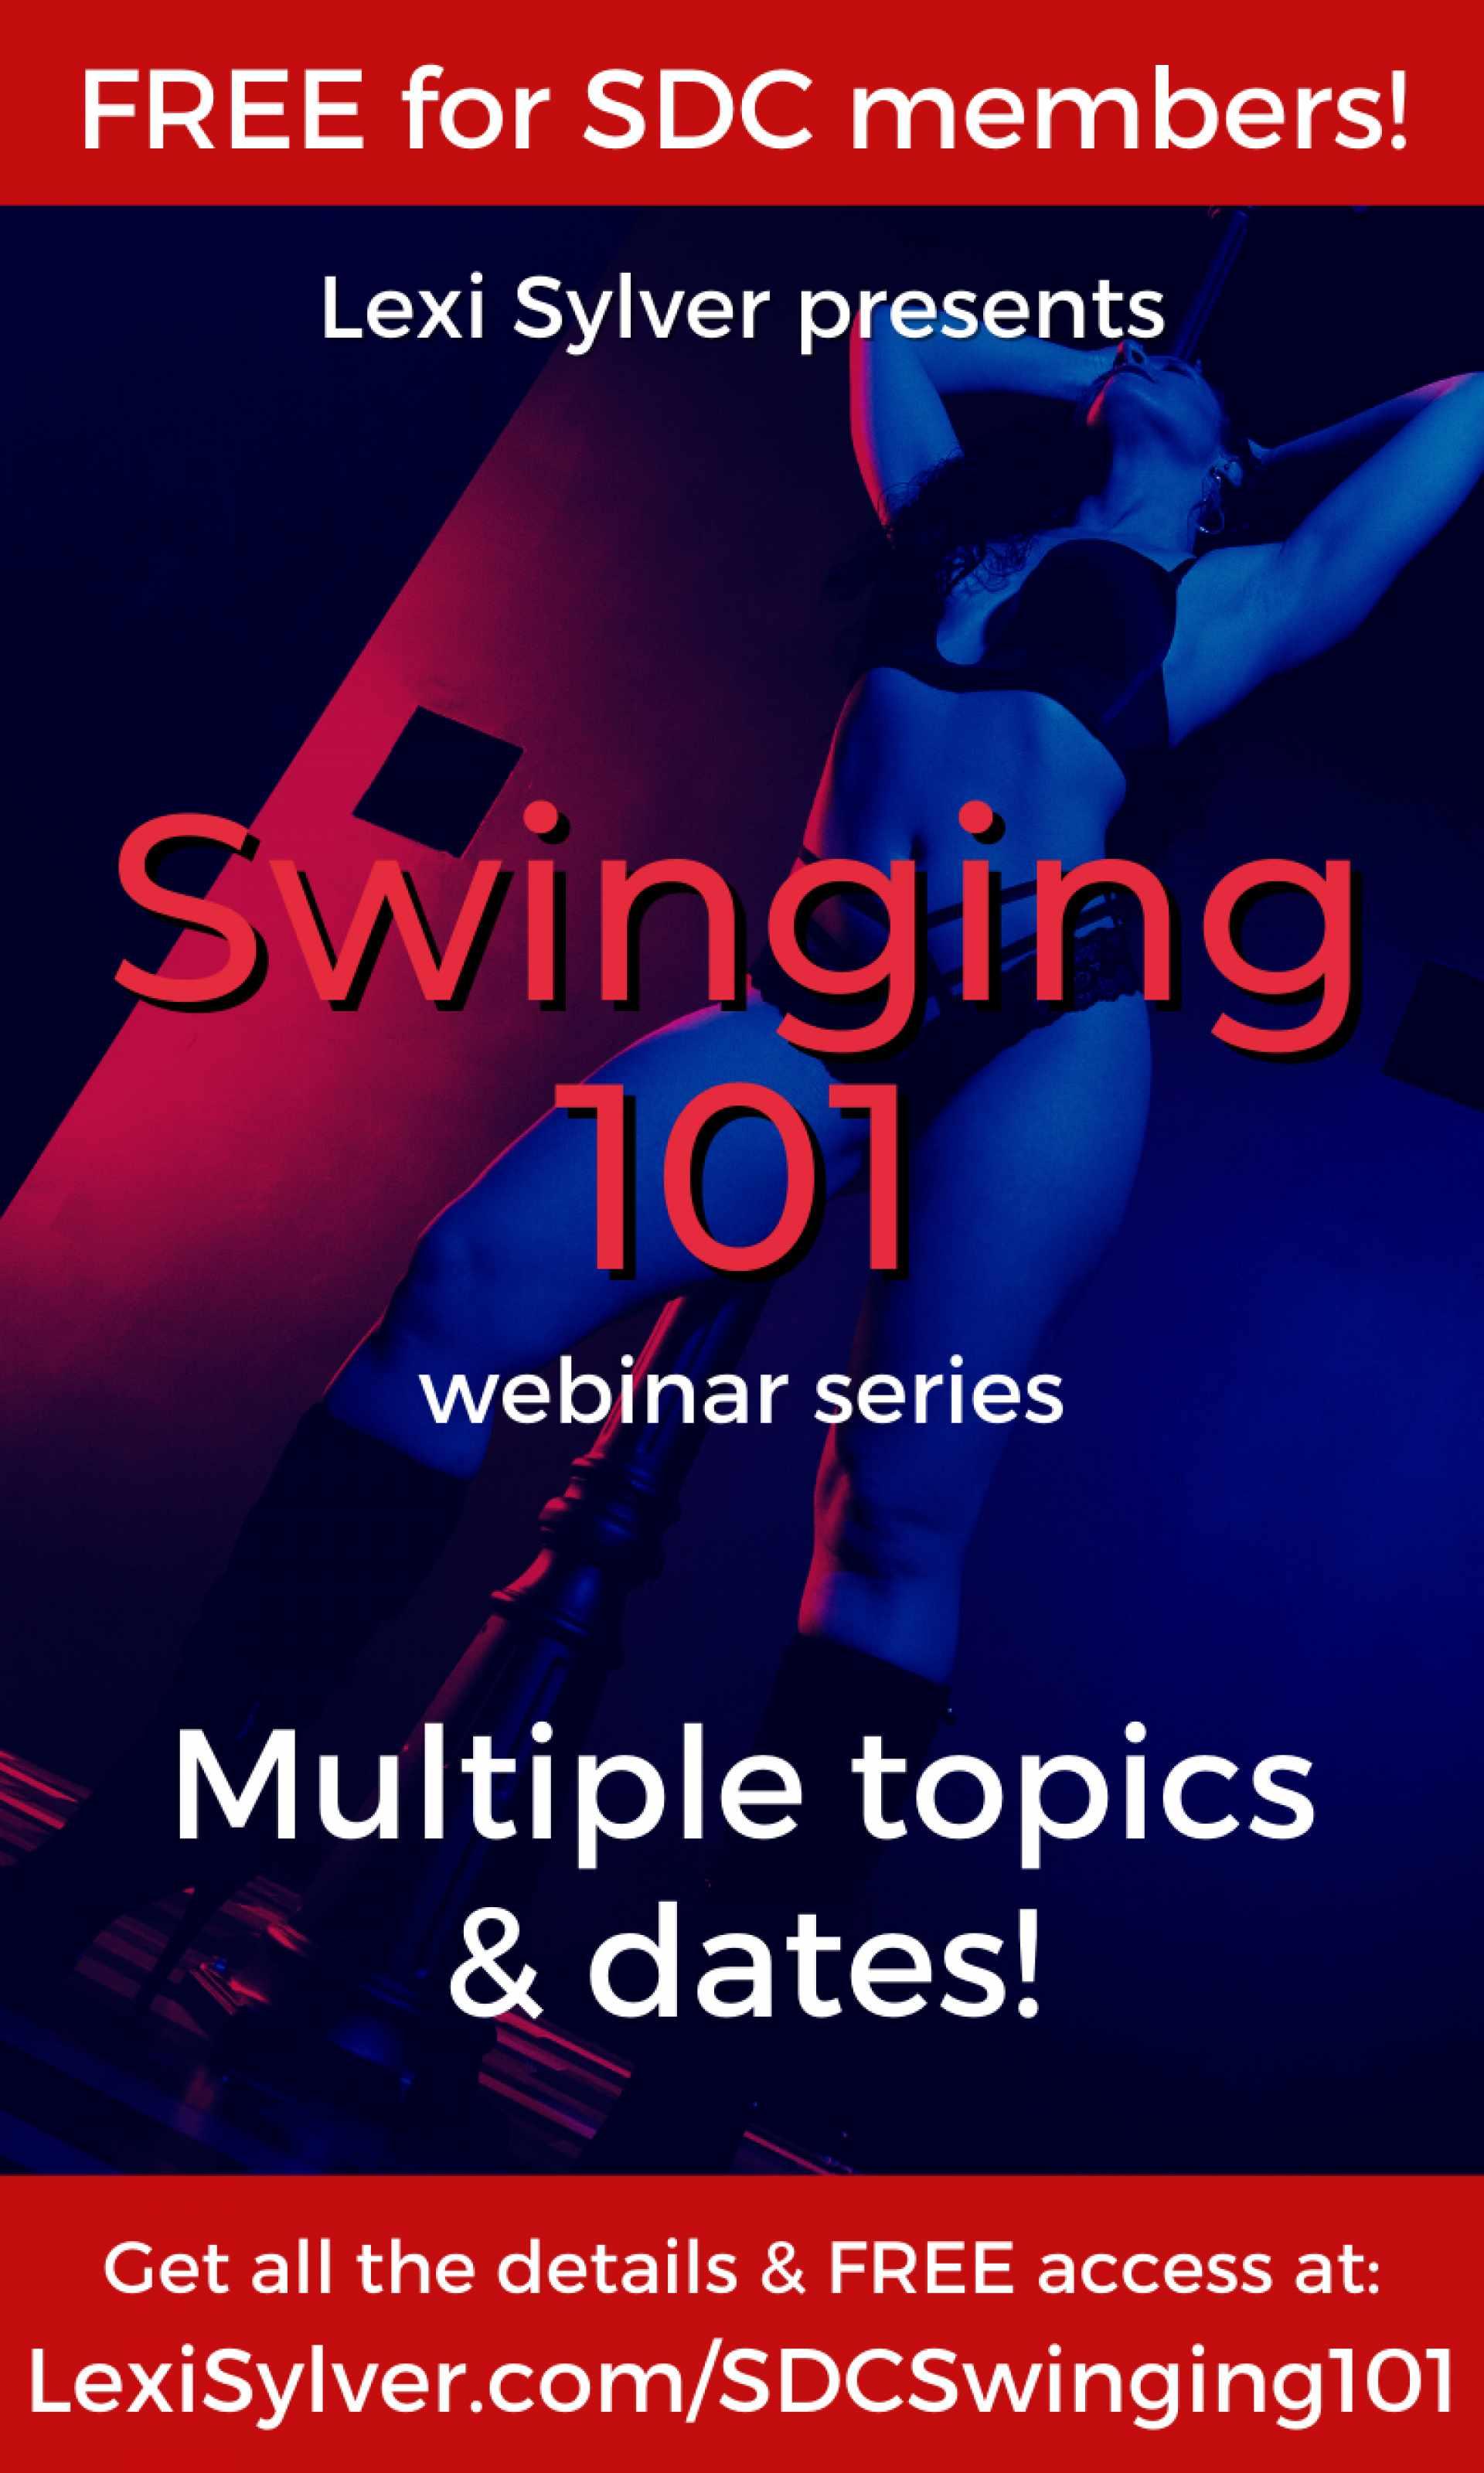 Lexi Sylver Swinging 101 Webinar Series